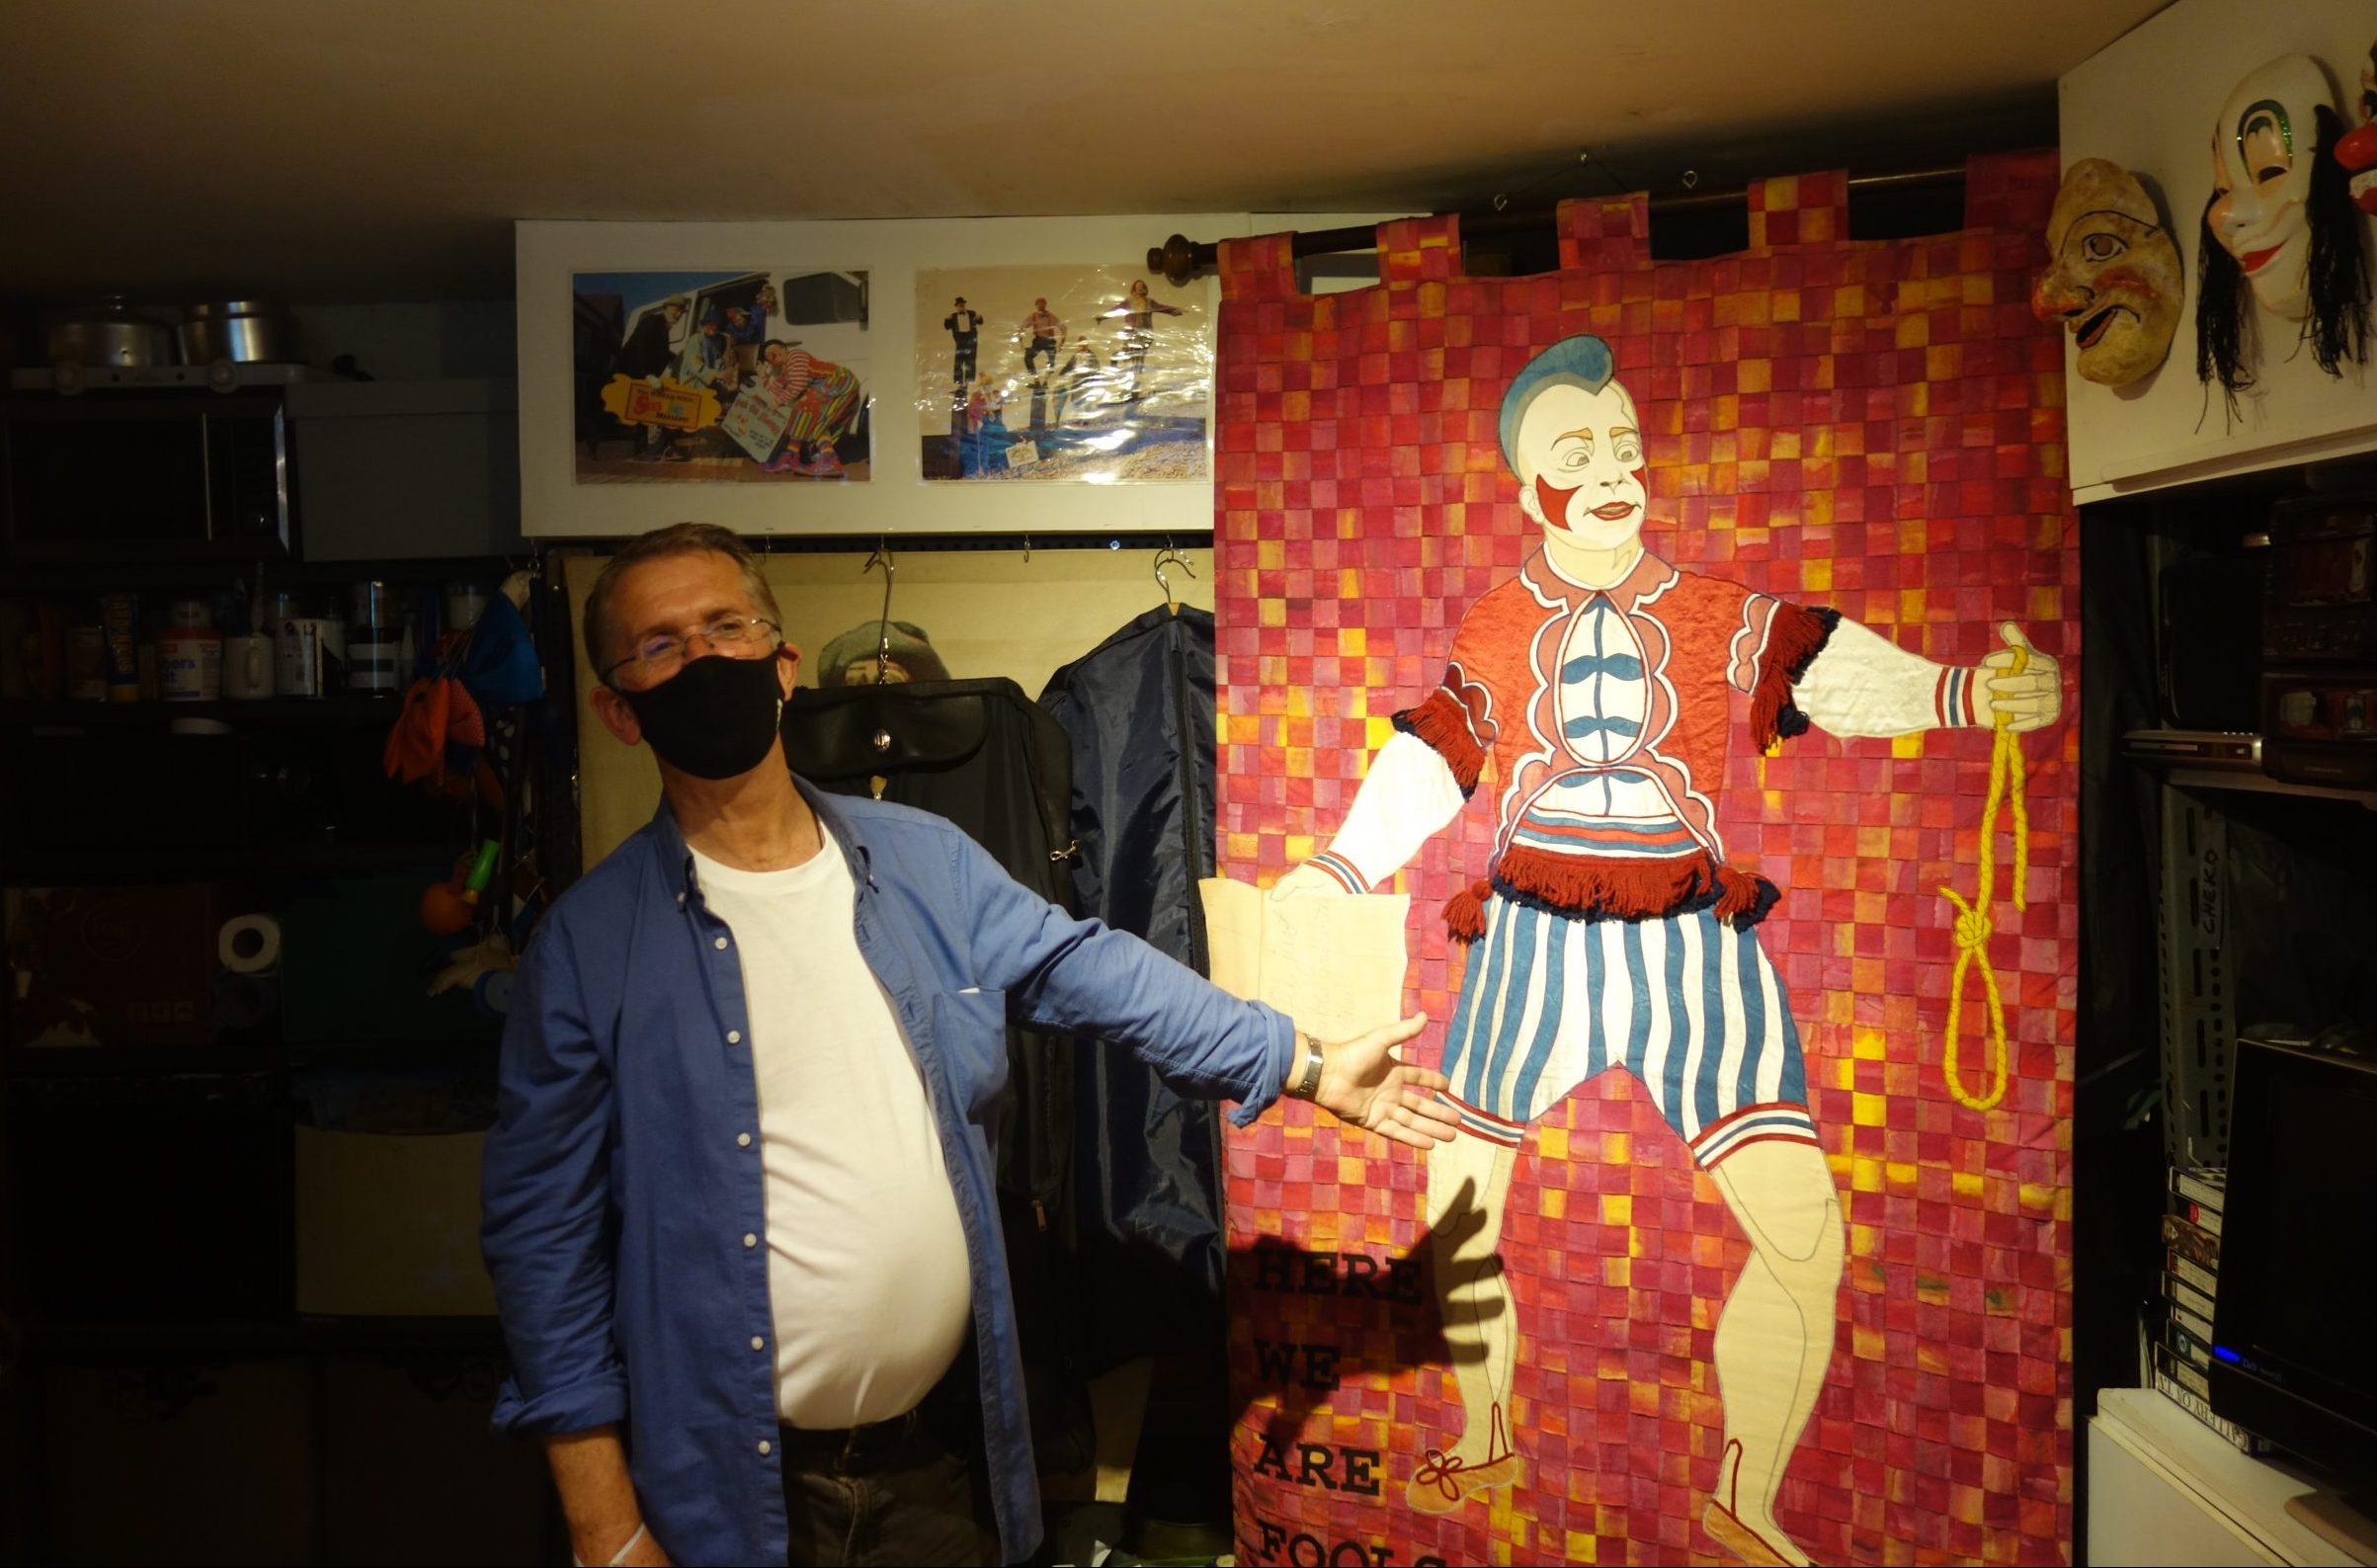 Clerkenwell's clown Mattie Faint getting into character CreditMattie Faint